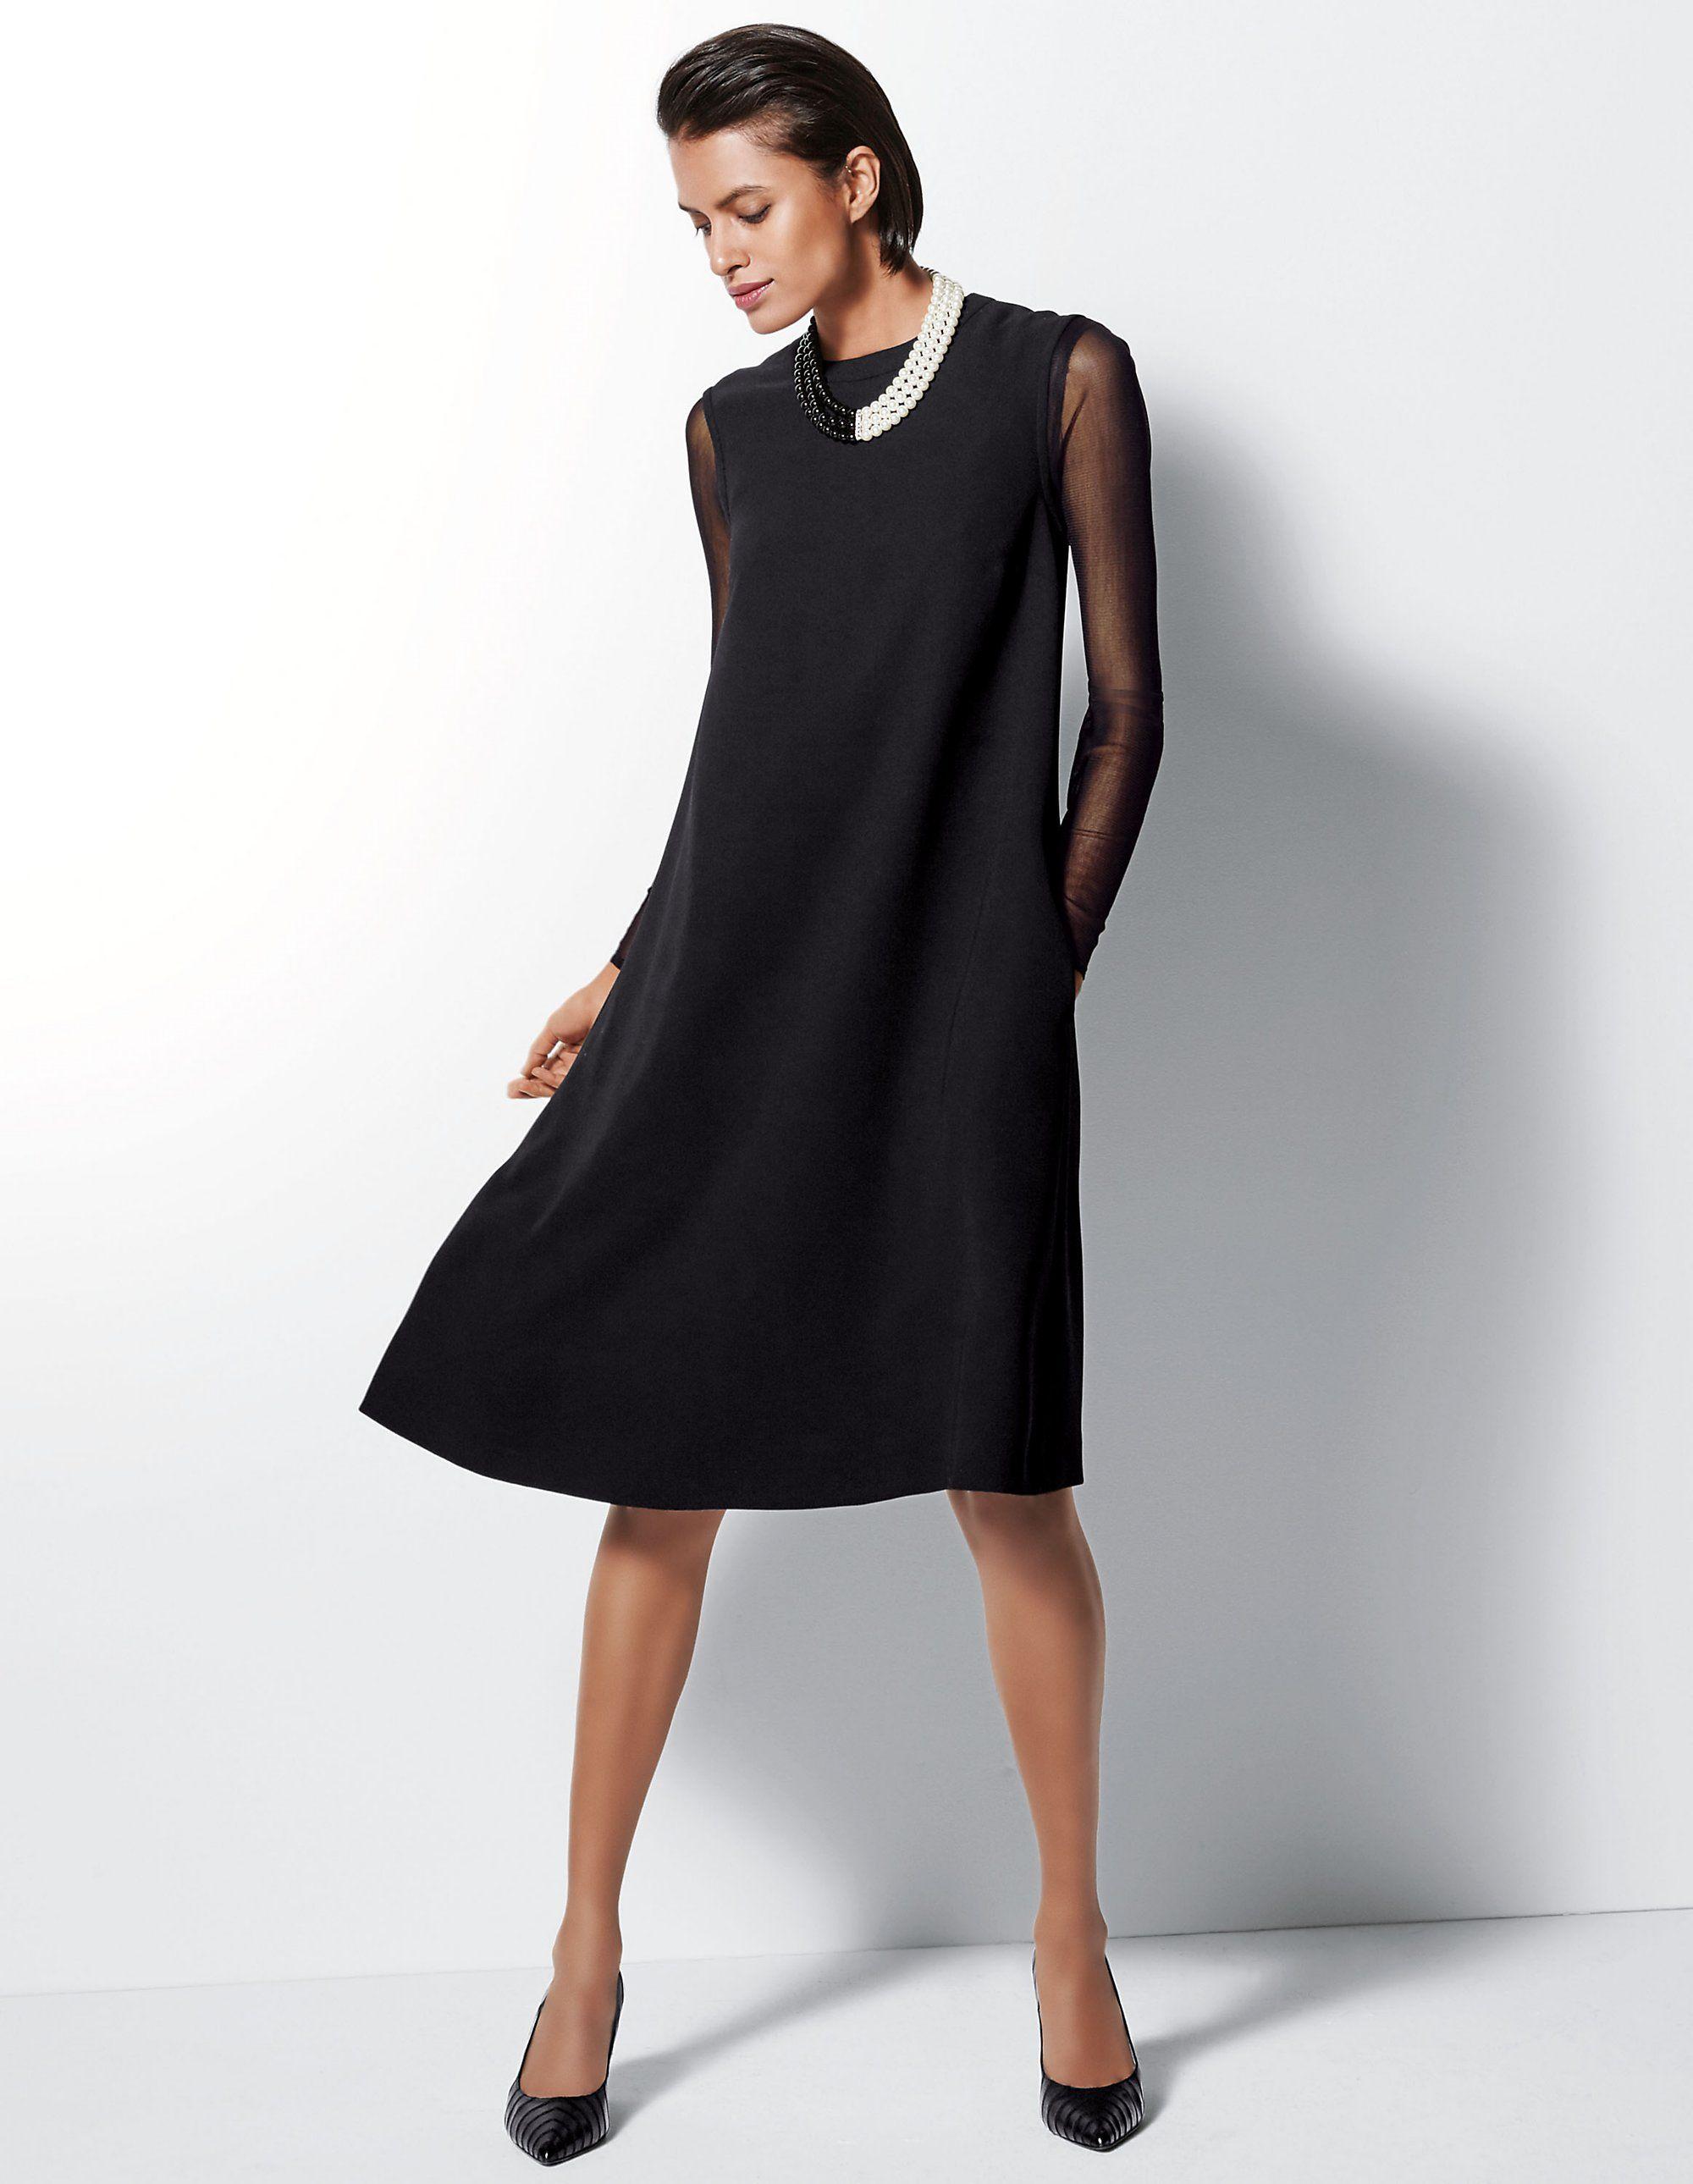 Kleid a linie elegant